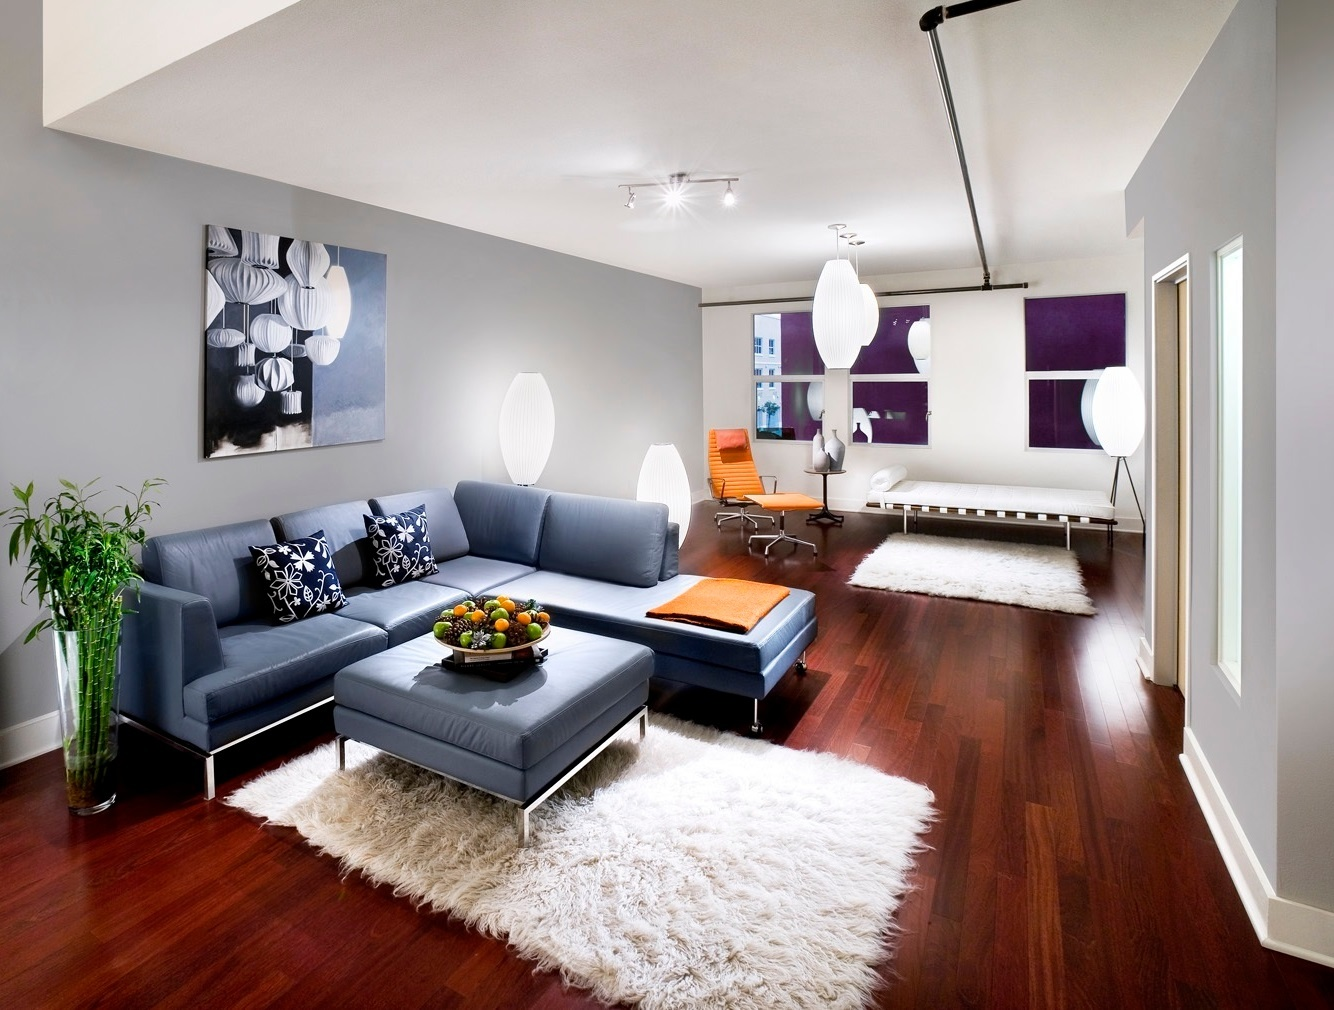 modern small living room furniture ideas decor pics 25 best design cute set up in